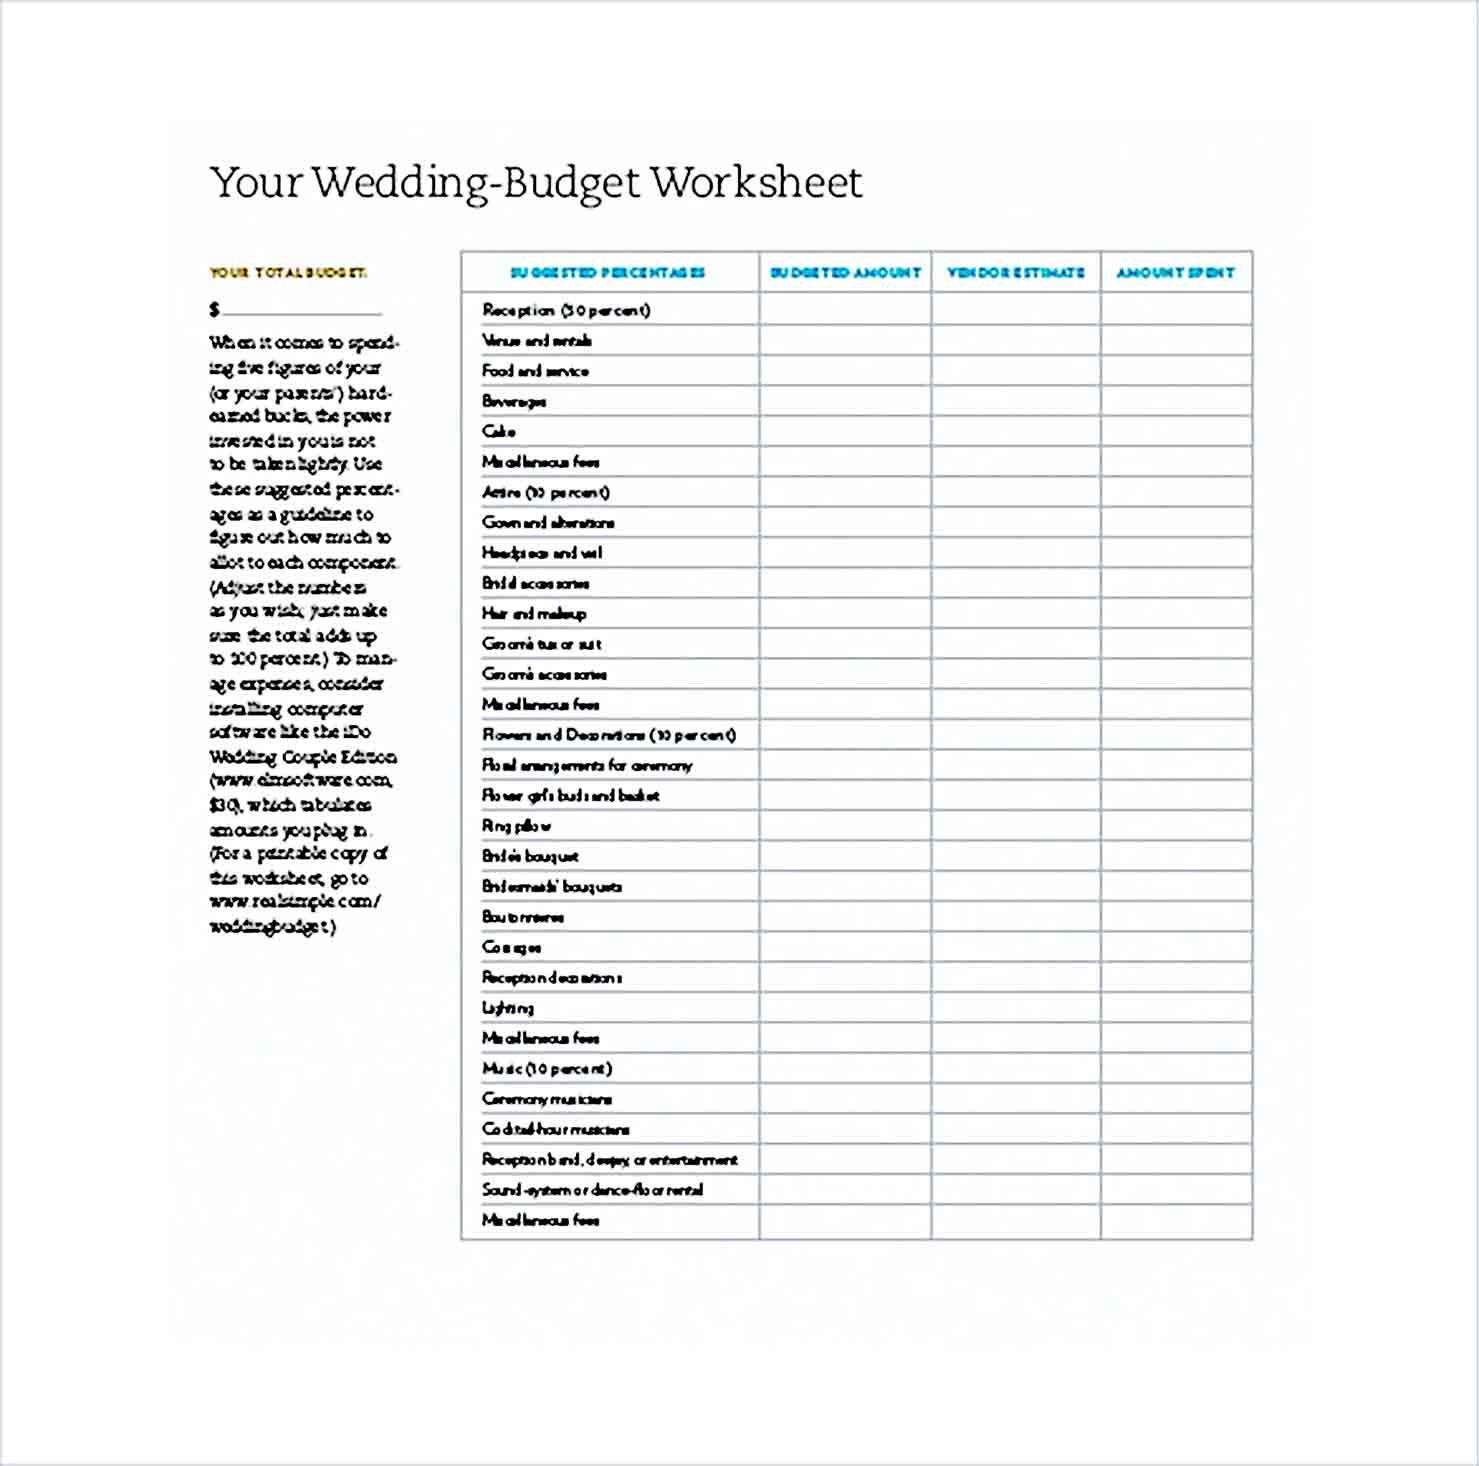 Sample Wedding Budget Worksheet